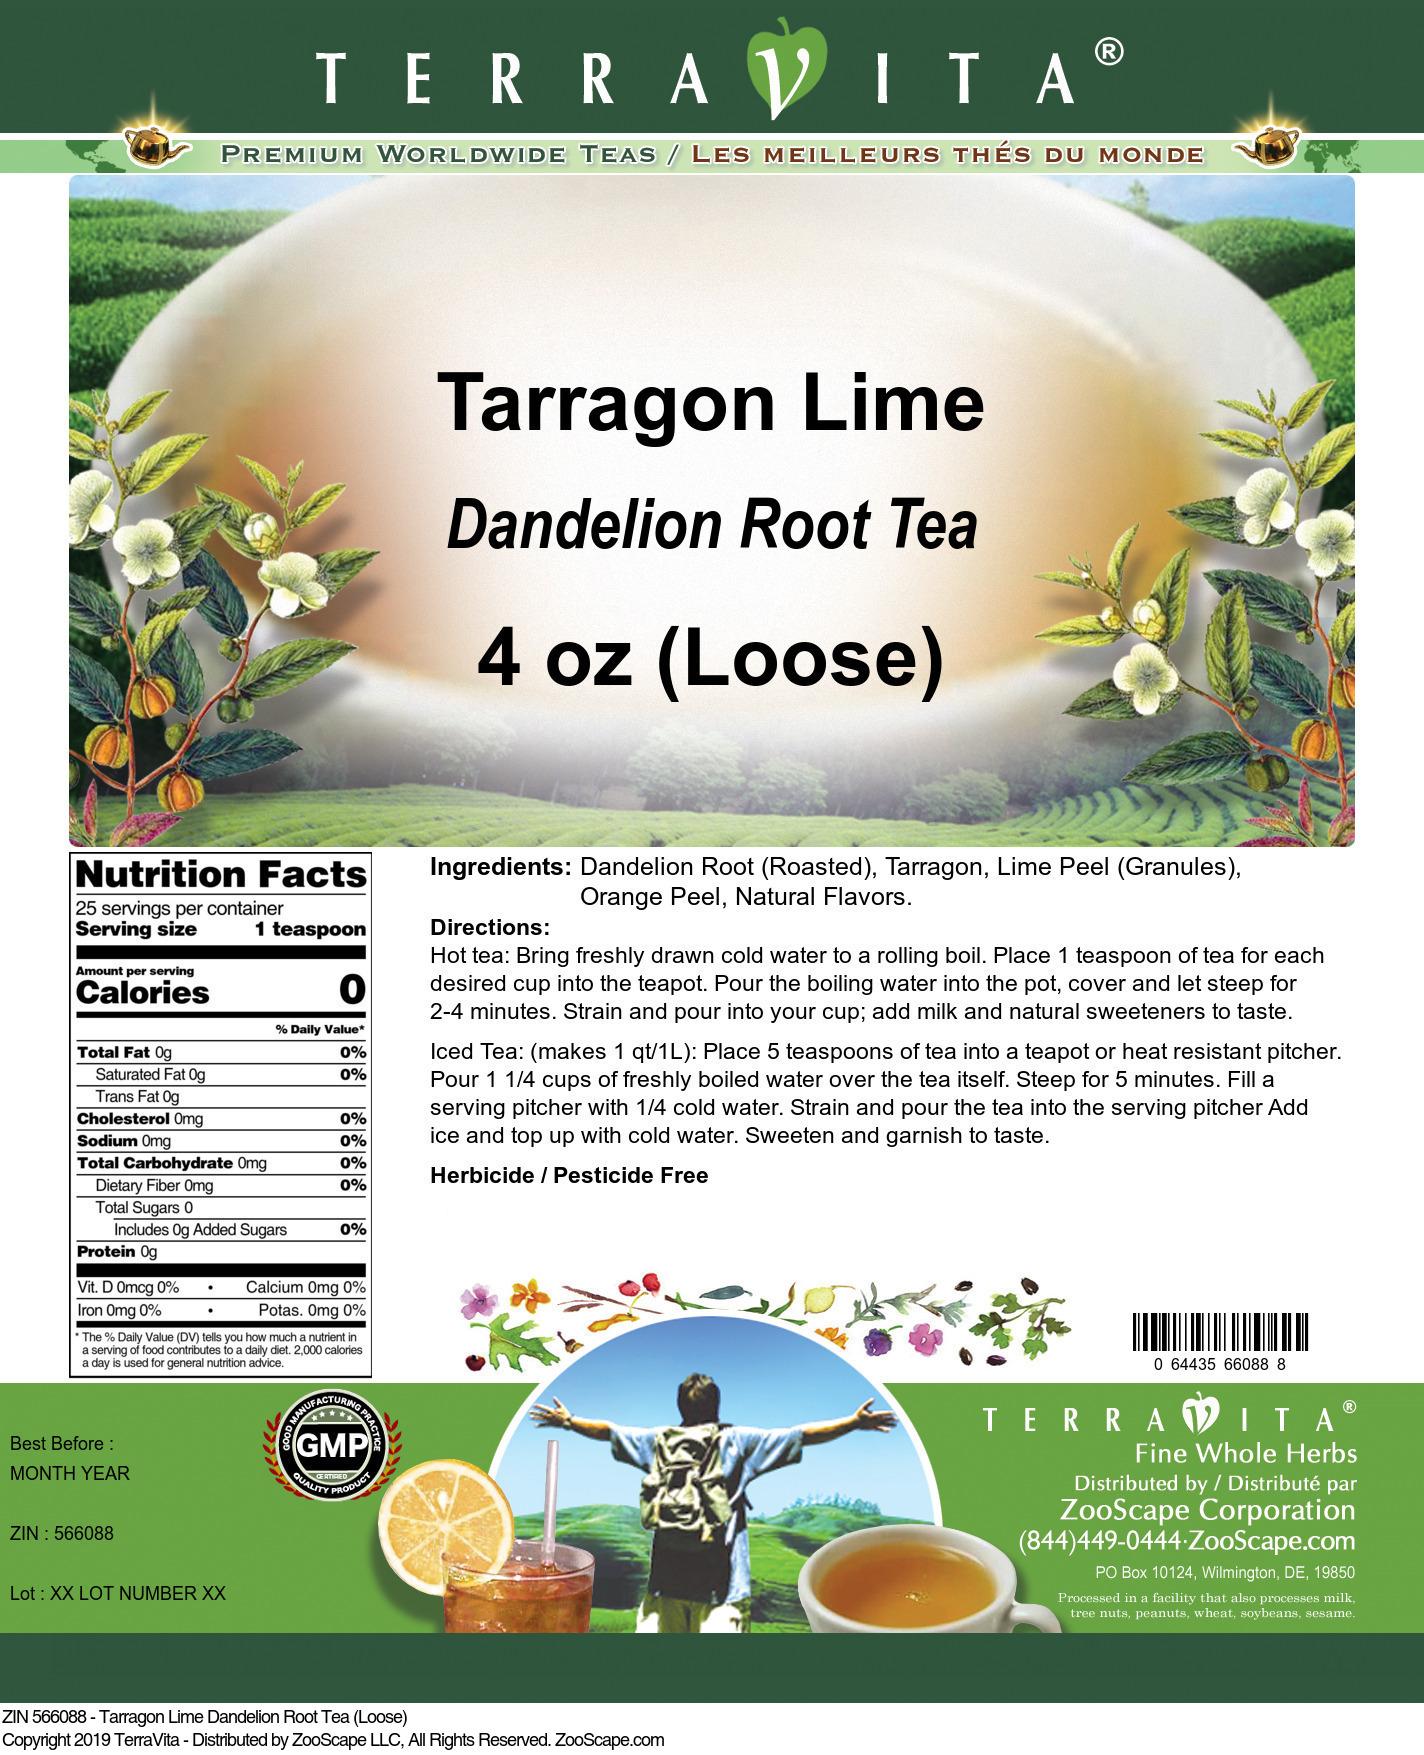 Tarragon Lime Dandelion Root